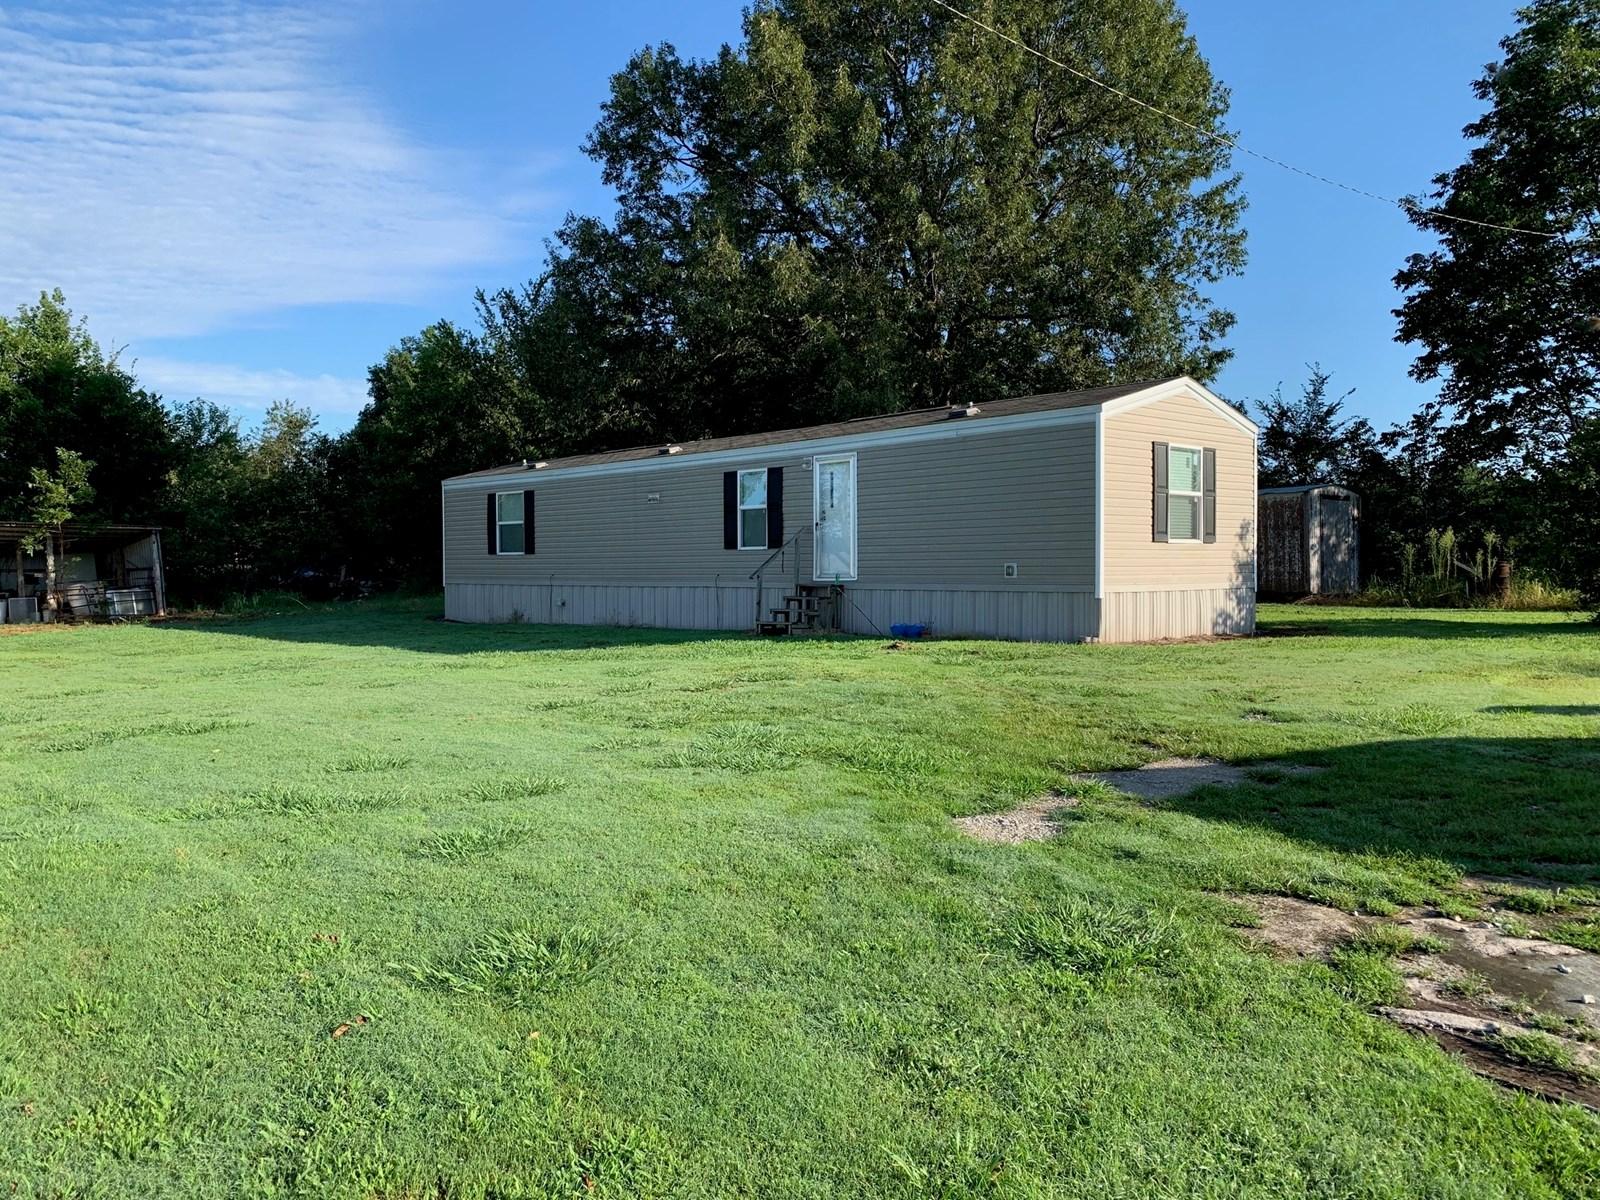 Manufactured Home in Maynard Arkansas